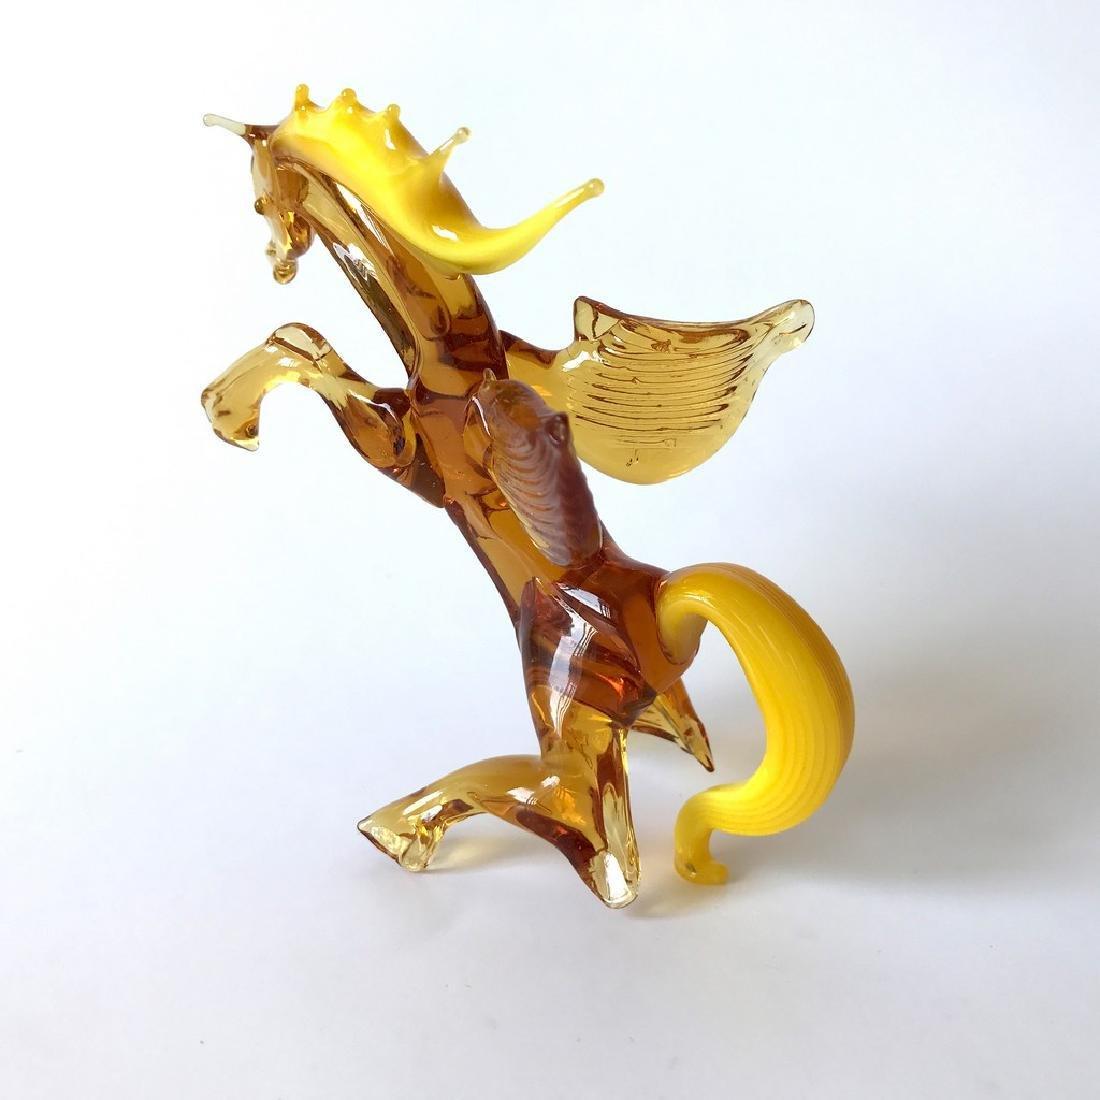 Figurine of Pegasus the winged horse amber coloured - 3